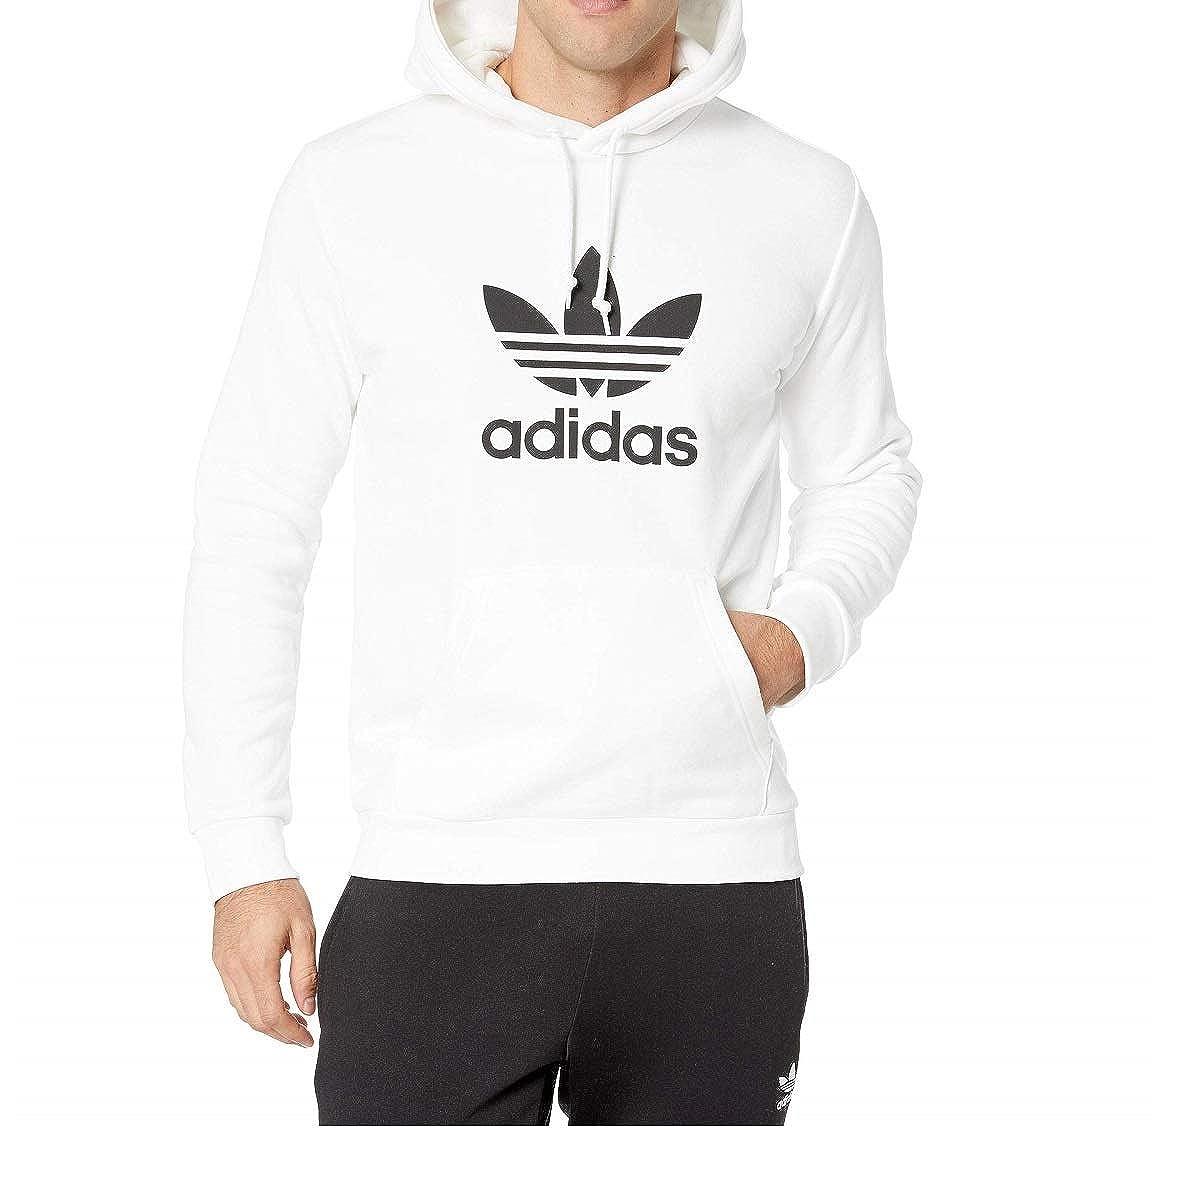 0103d73035efd adidas Originals Men's Trefoil Hoodie